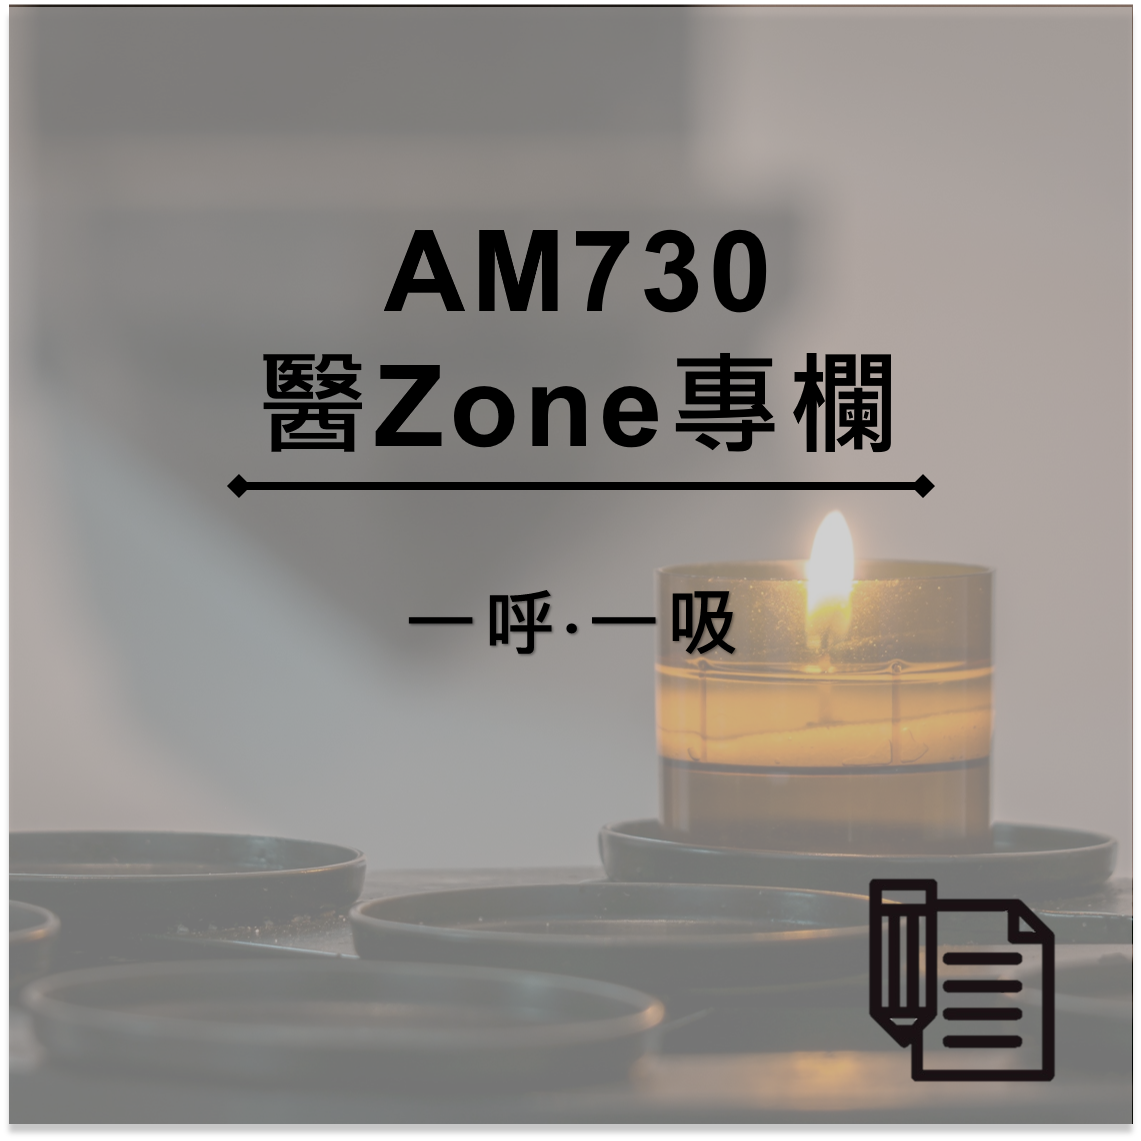 AM730 醫Zone 專欄 - 一呼‧一吸